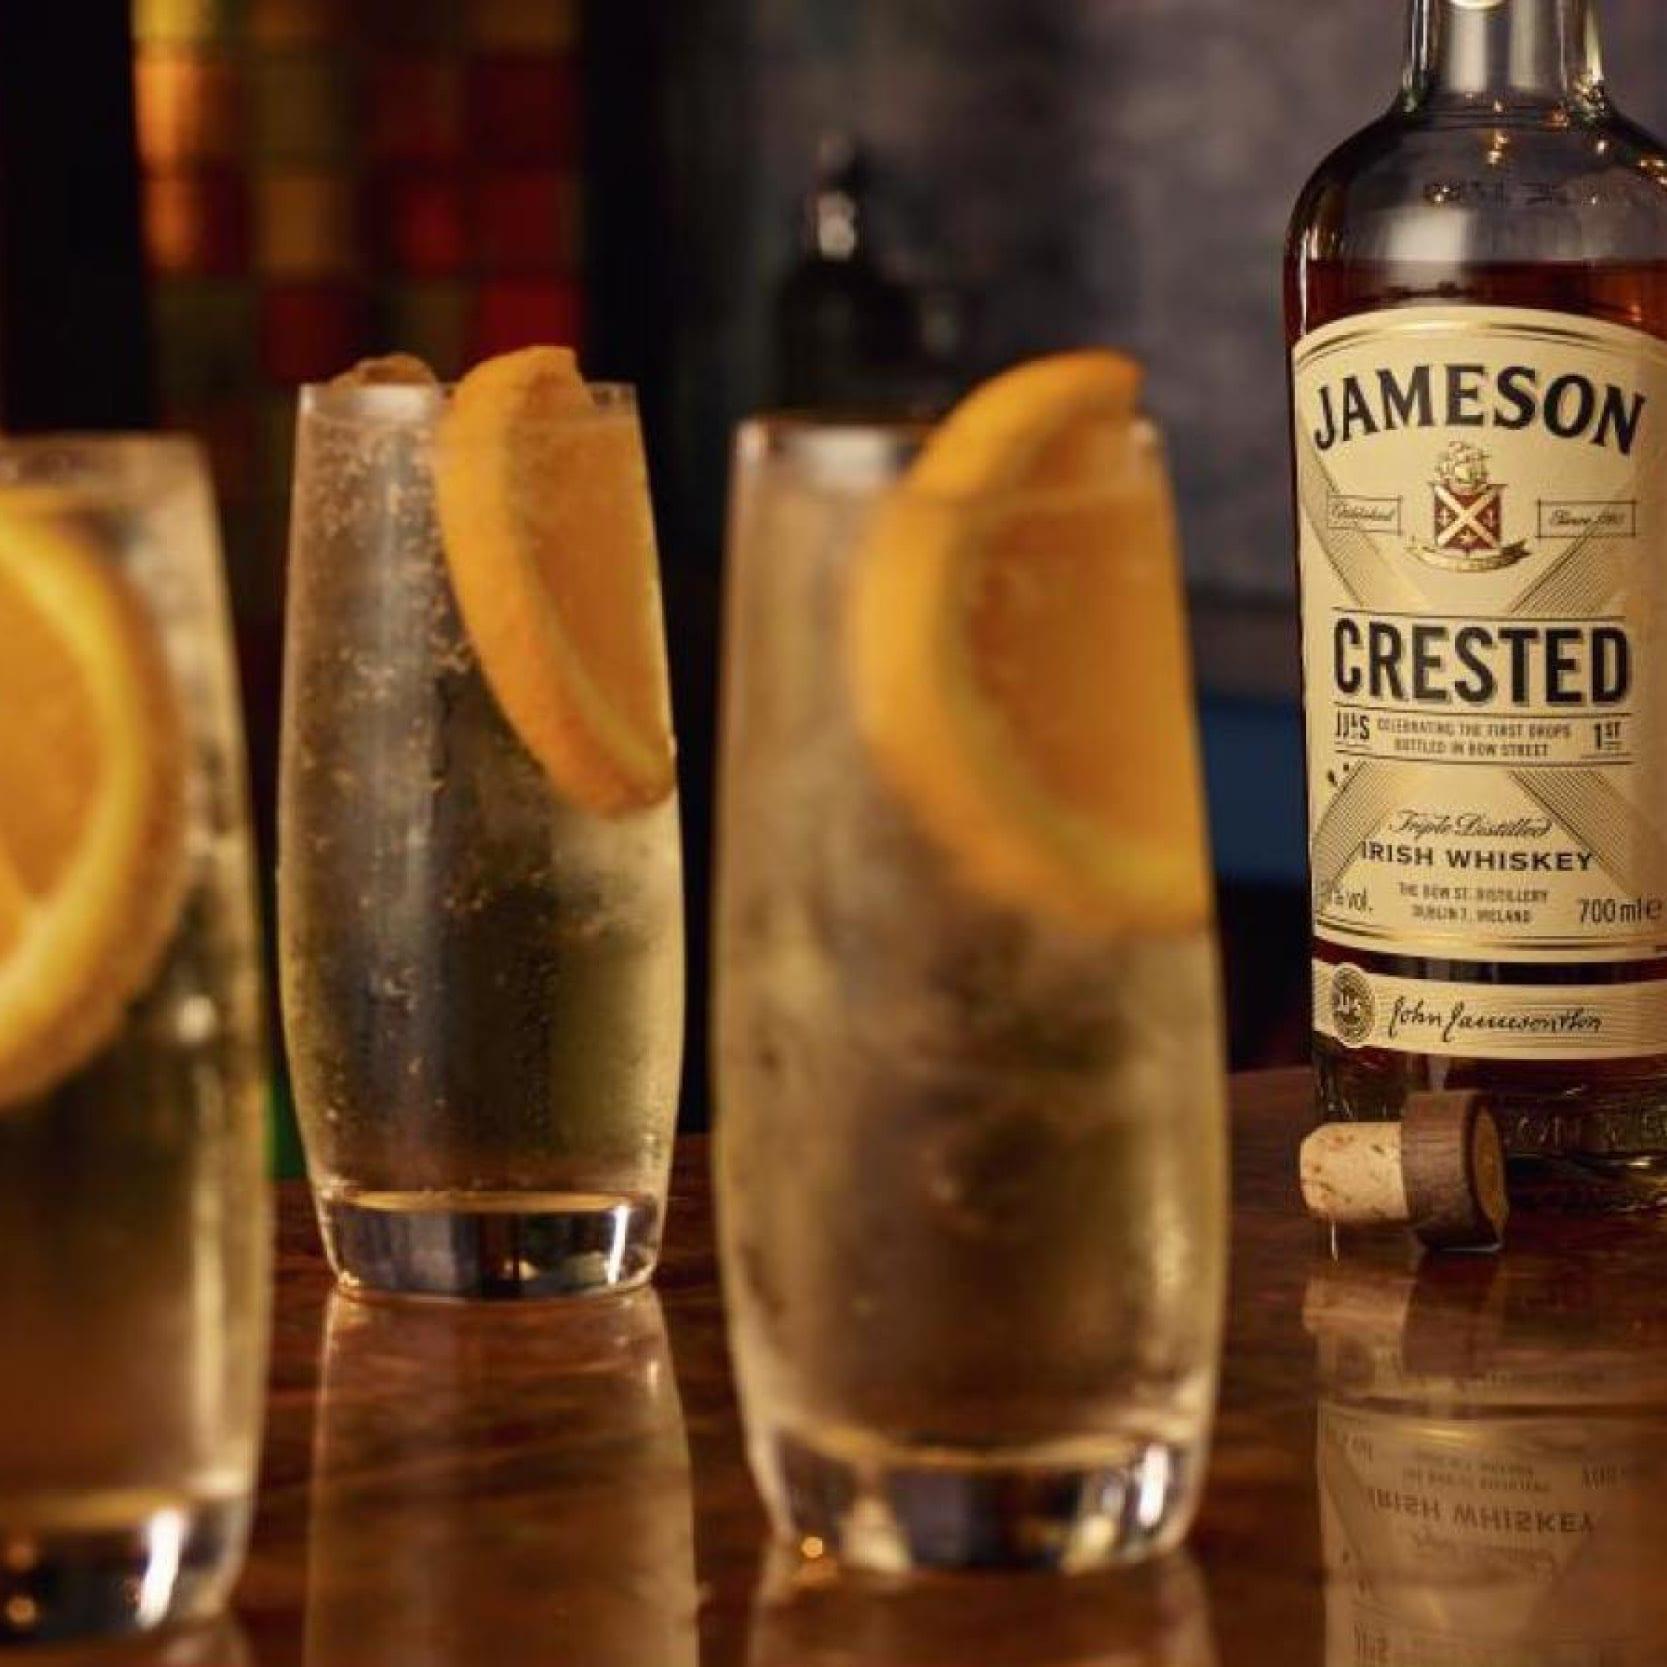 Jameson Crested, Soda and Orange